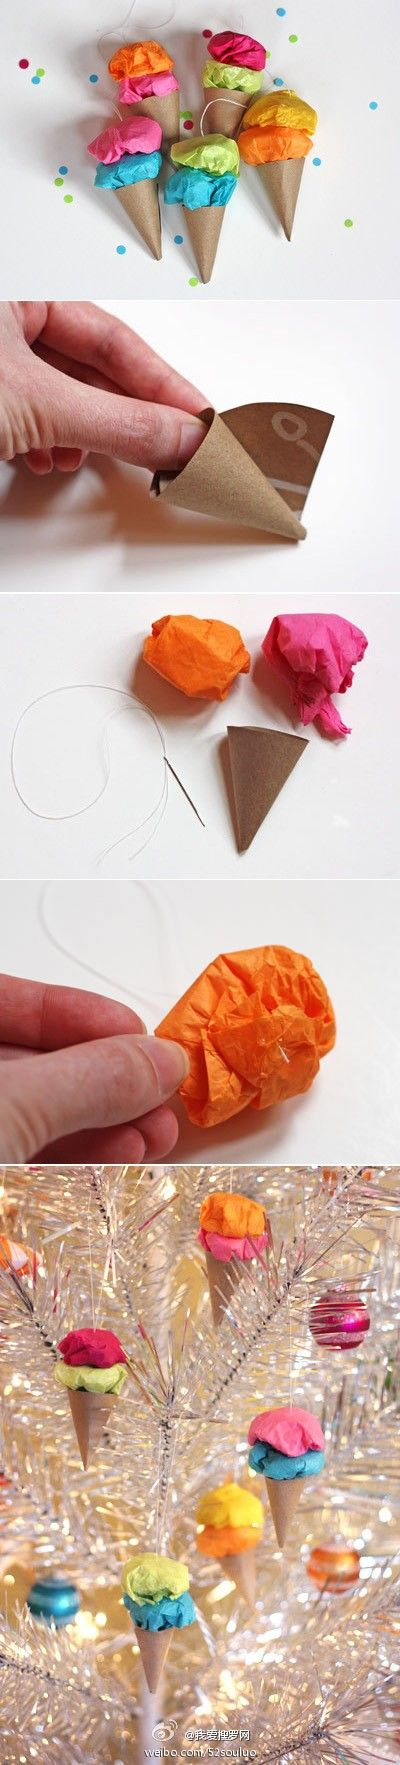 DIY tiny ice cream cones